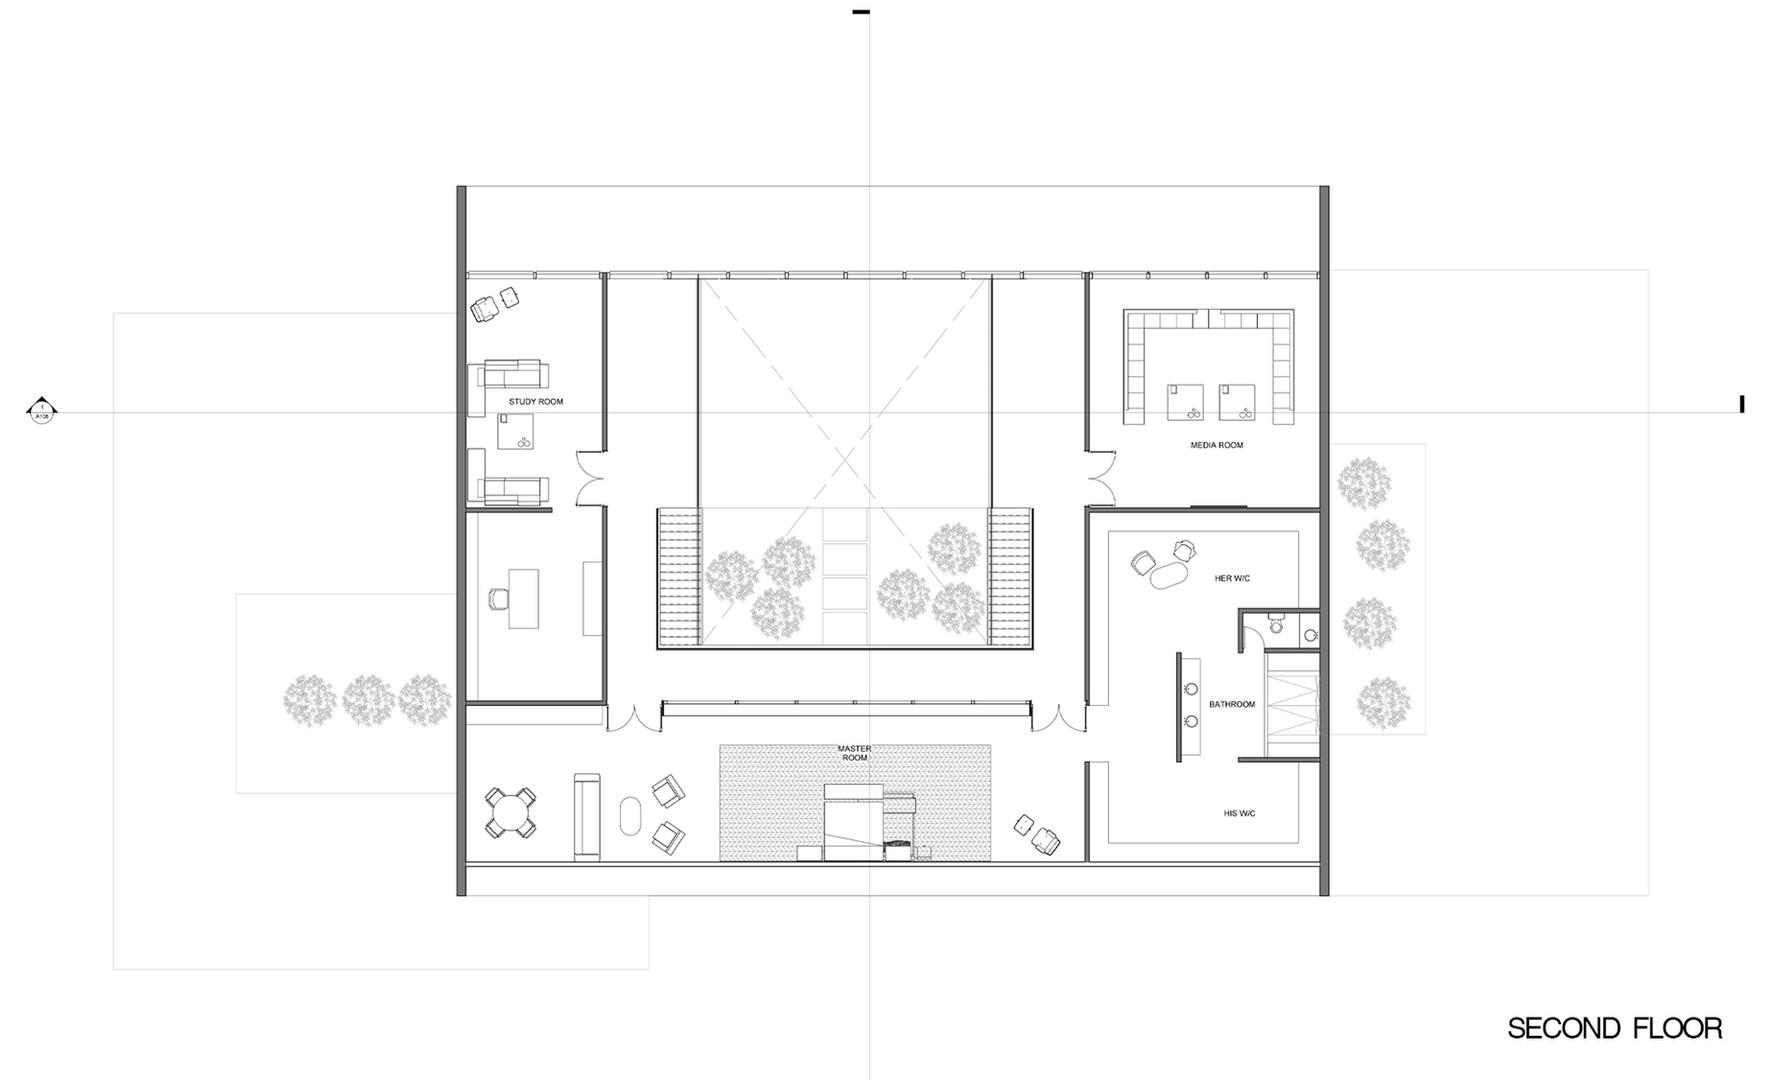 Second_Floor_Miró_Picasso_Homes.jpg